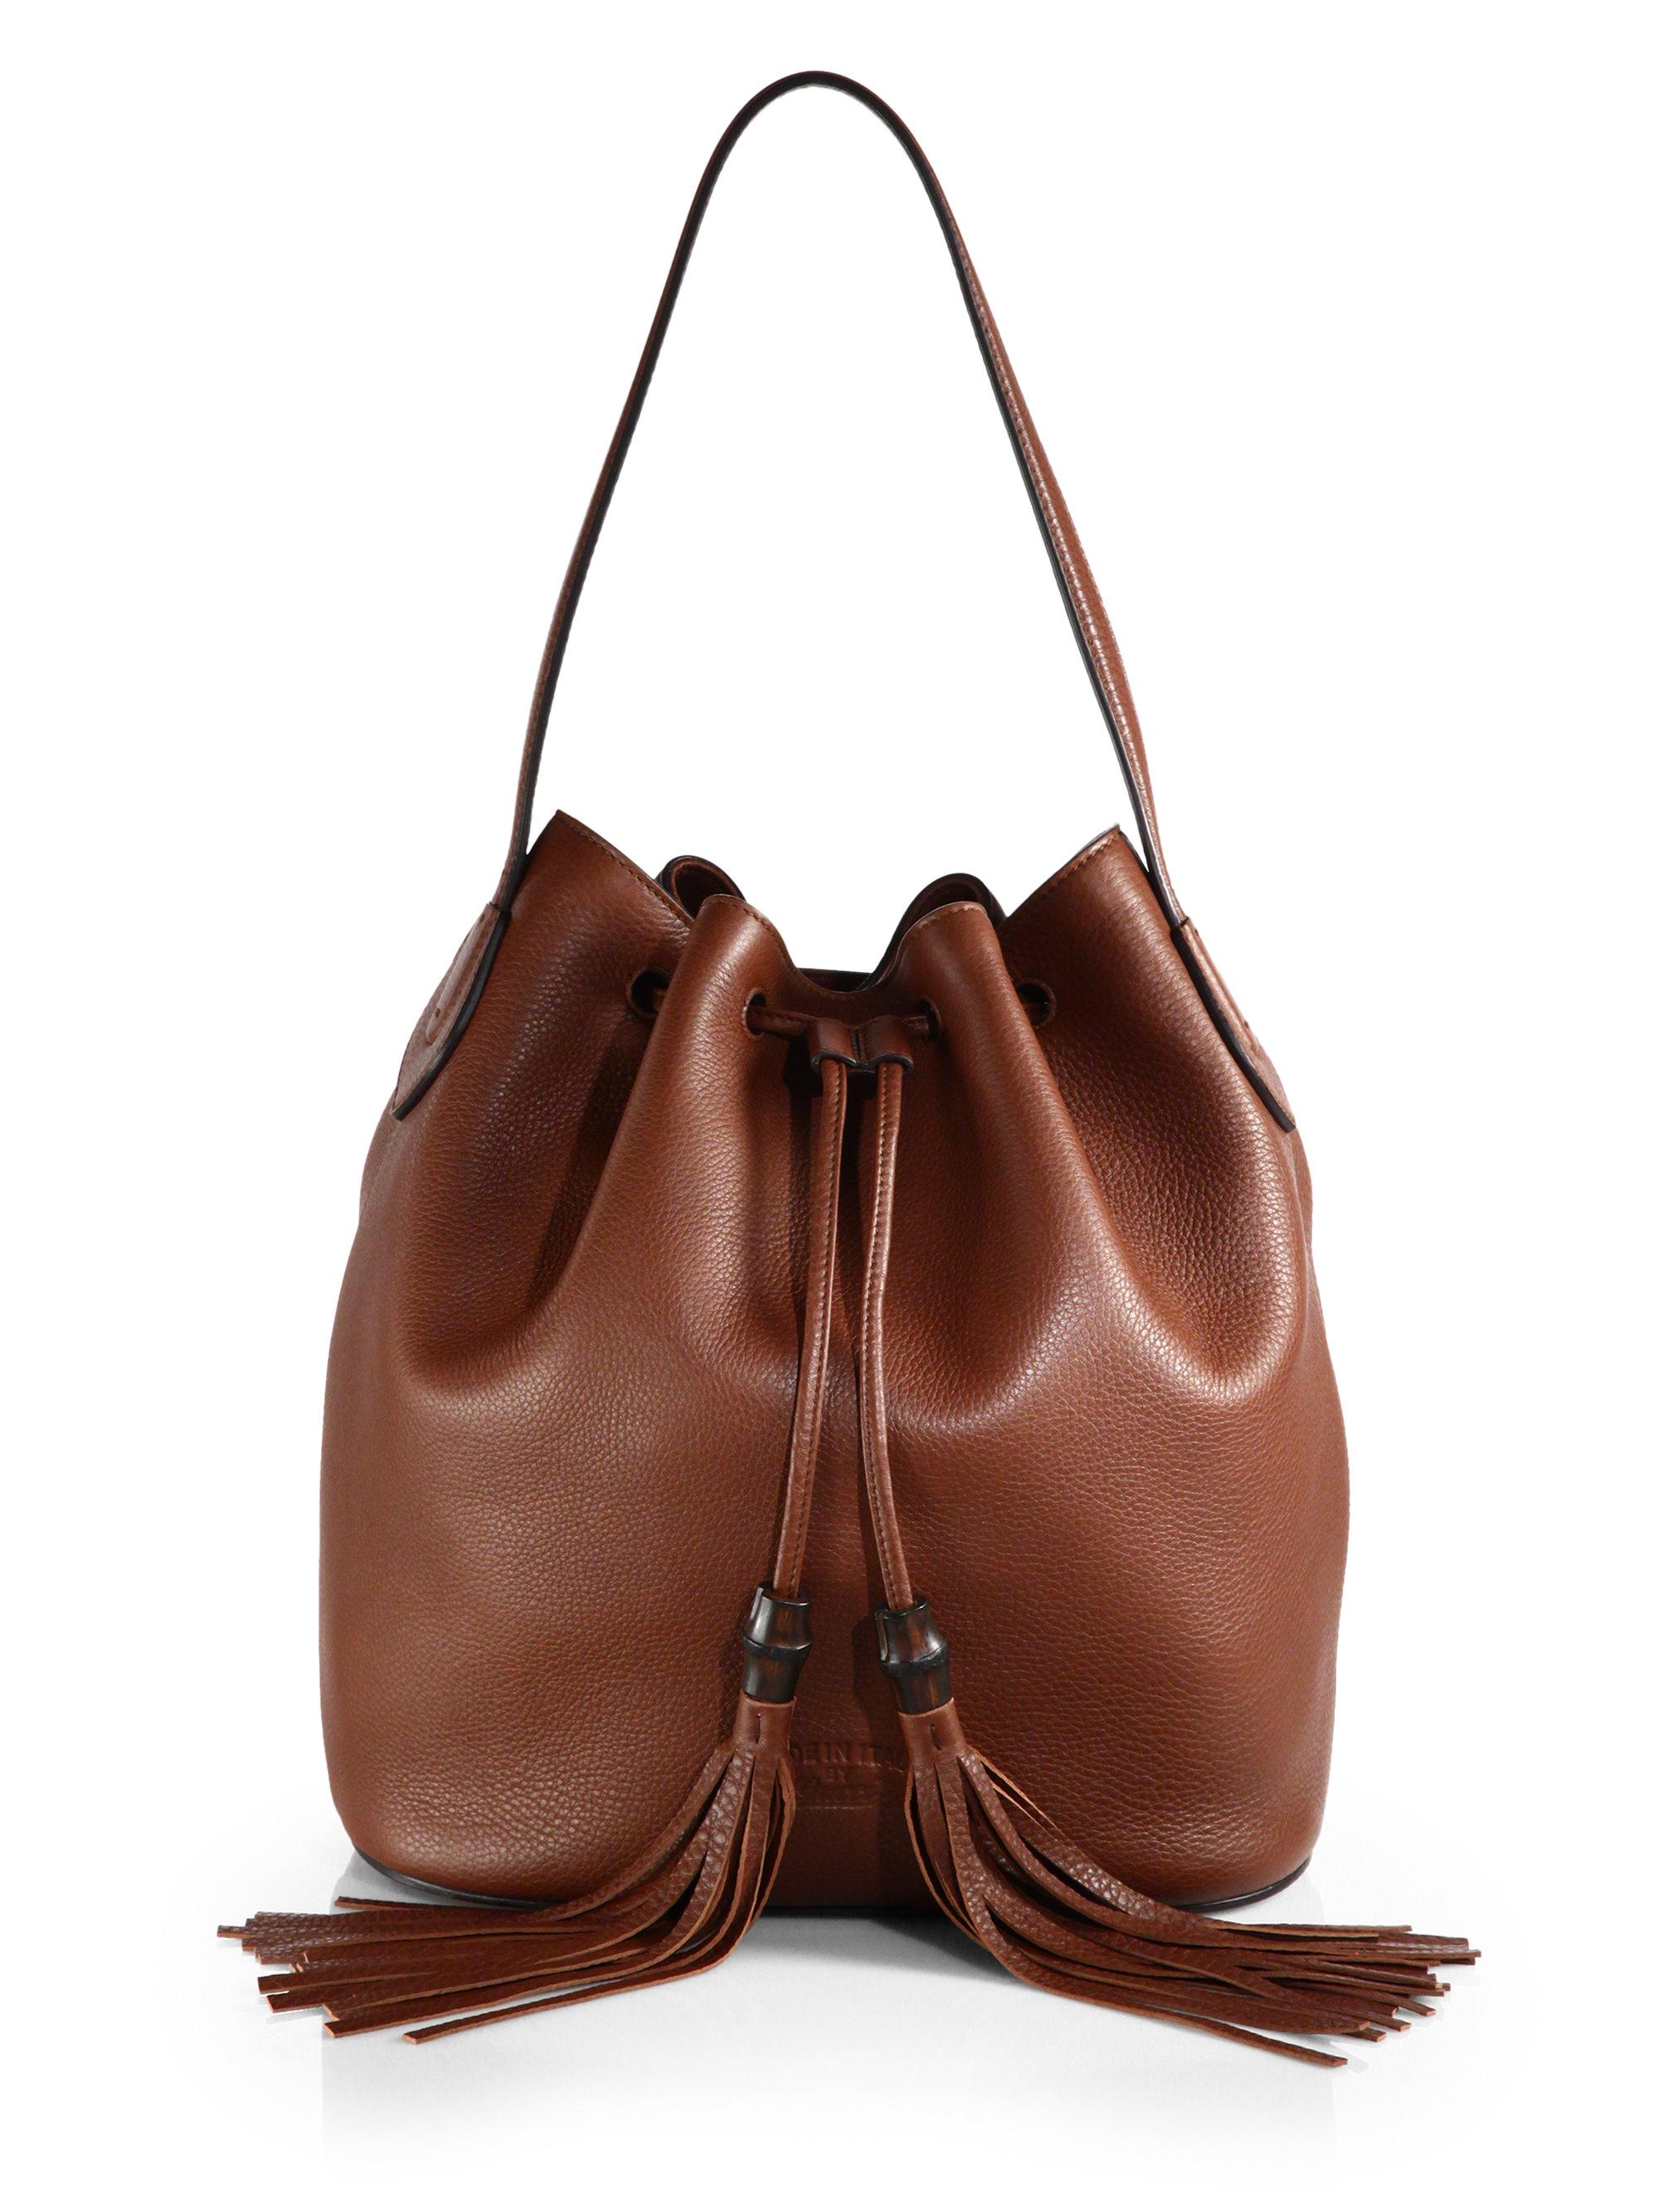 Gucci Lady Tassel Leather Bucket Bag In Brown Lyst